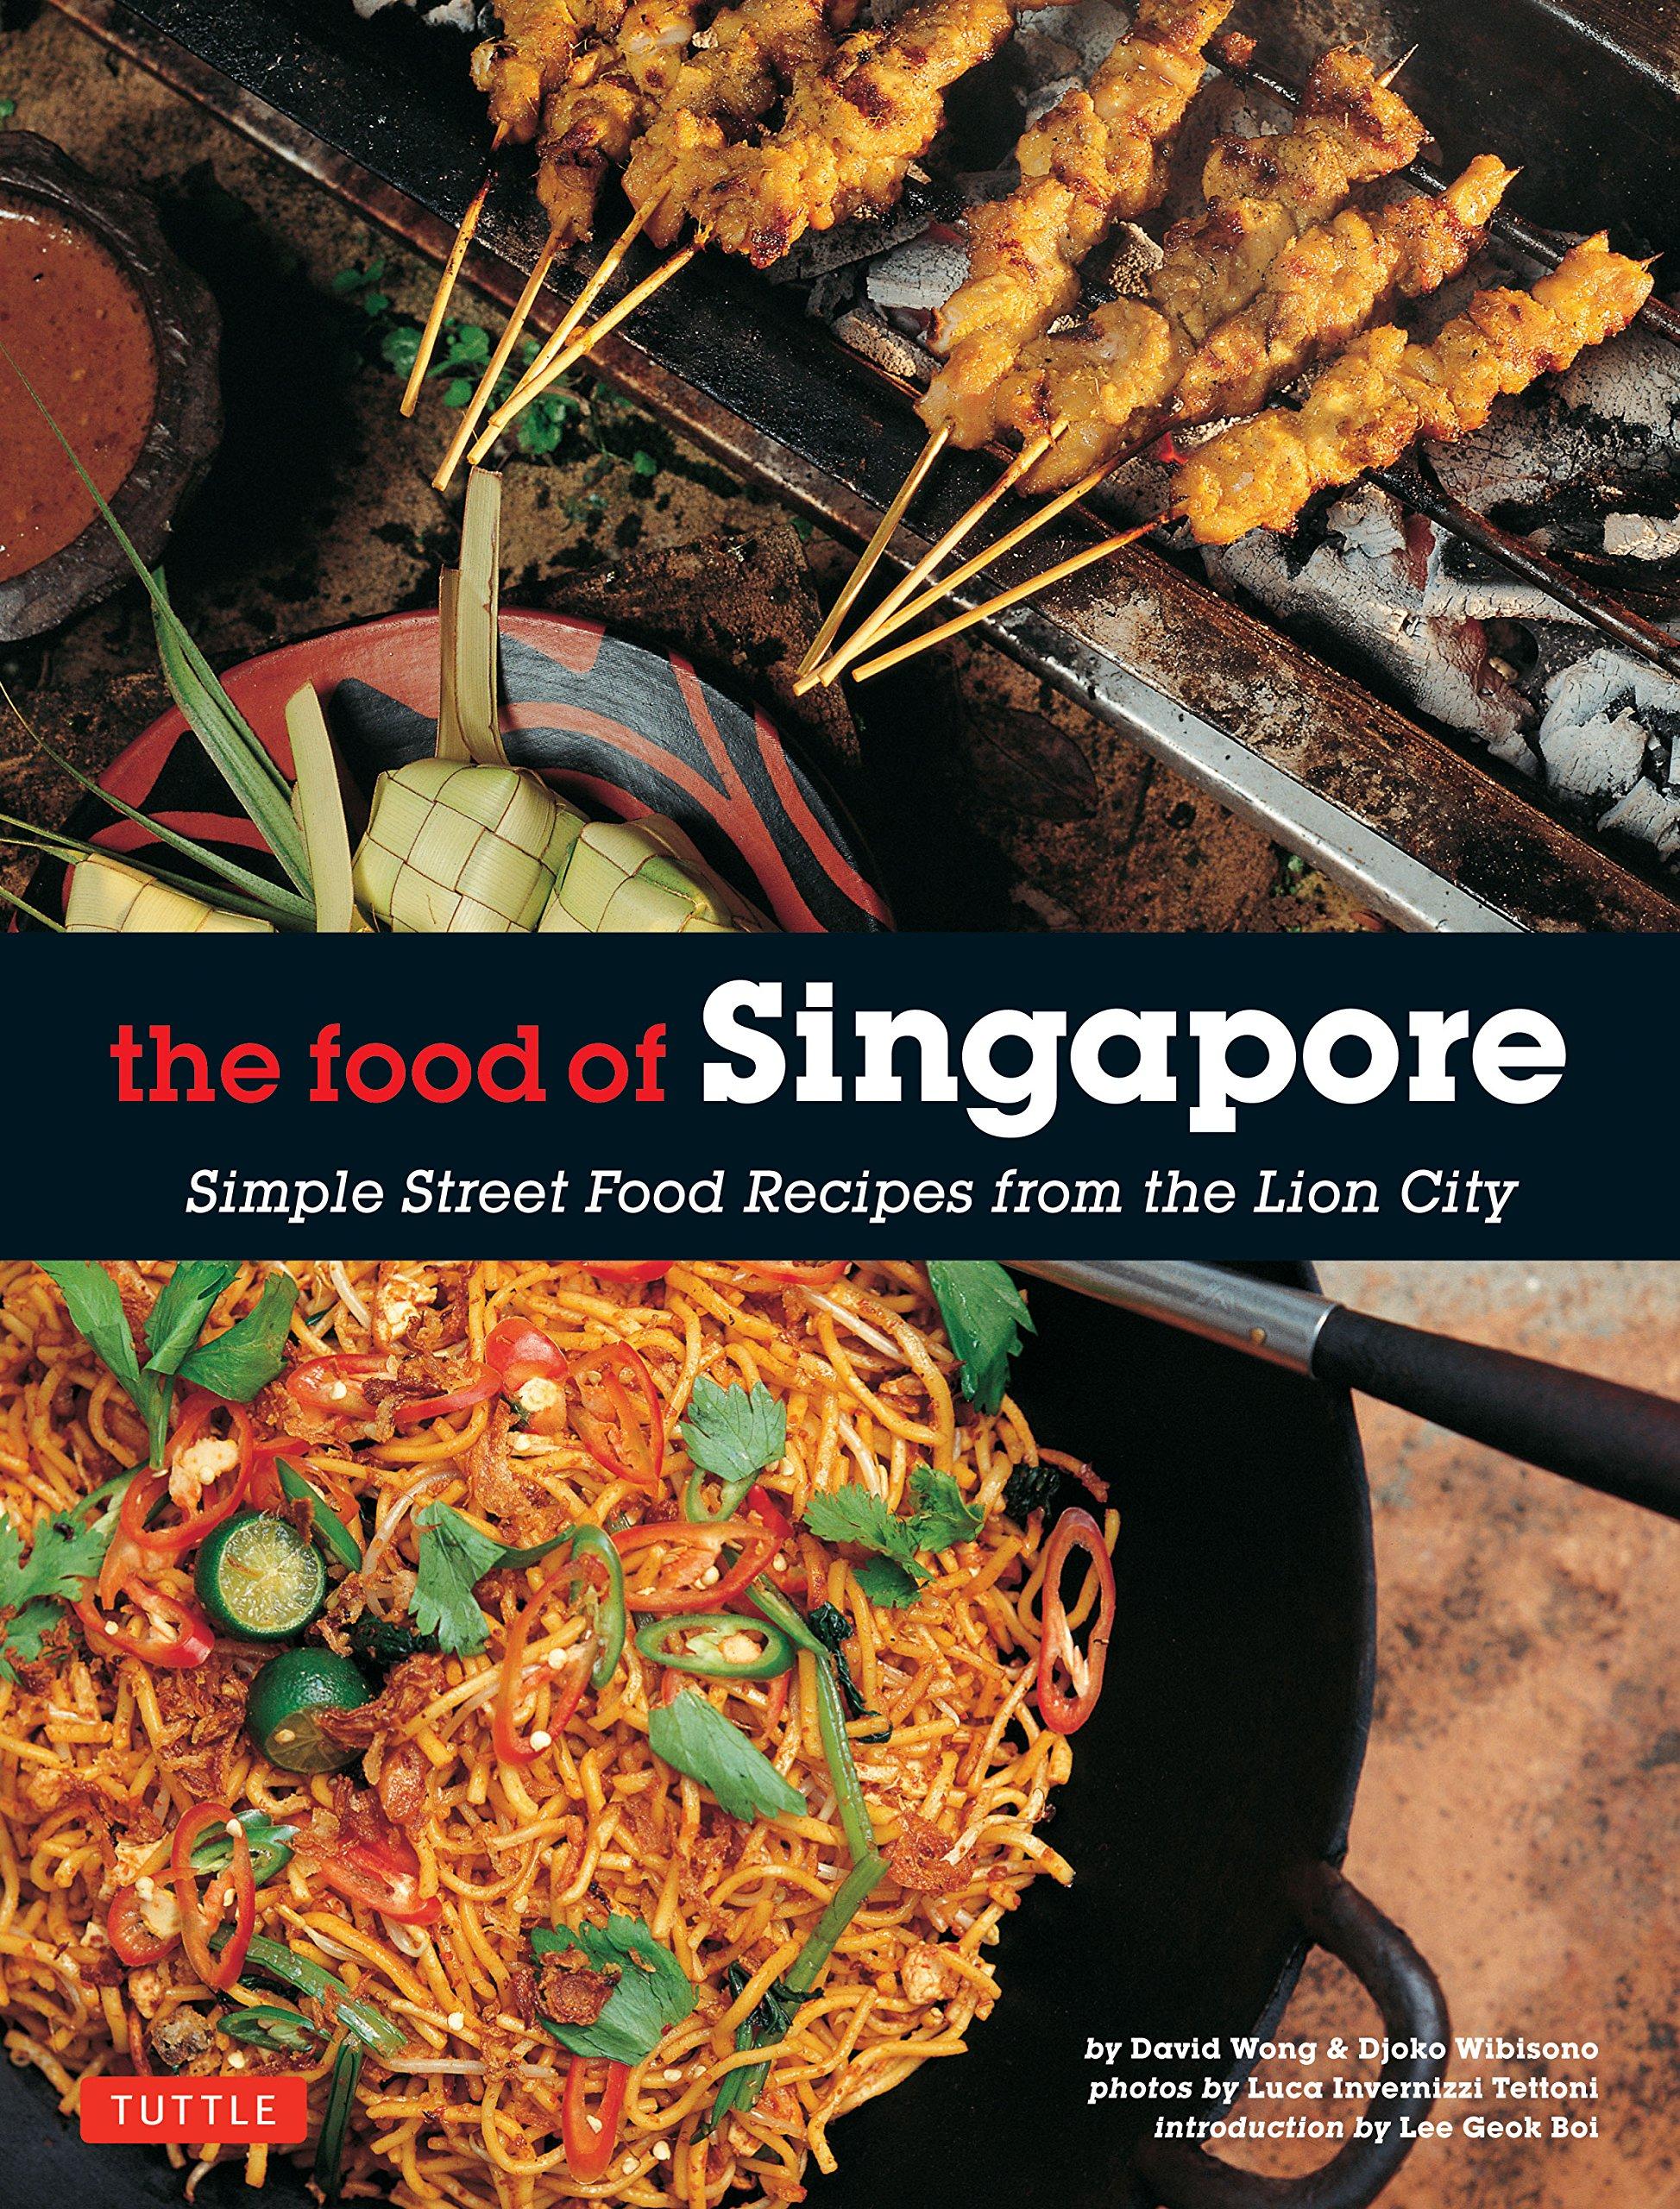 Food of singapore simple street food recipes from the lion city food of singapore simple street food recipes from the lion city singapore cookbook 64 recipes djoko wibisono david wong luca invernizzi tettoni forumfinder Choice Image